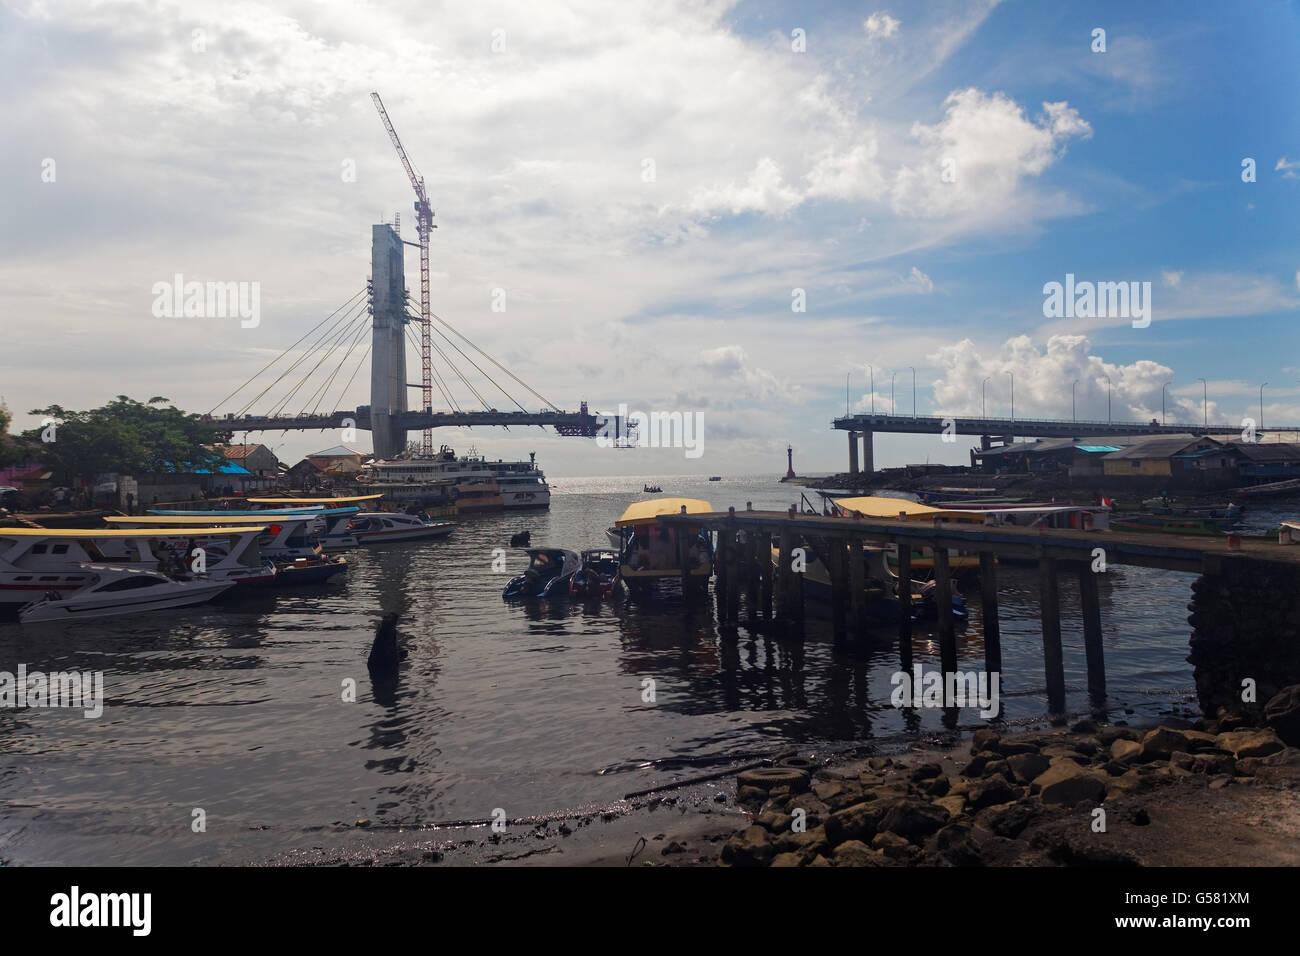 Soekarno bridge, Manado, Sulawesi, Indonesia Stock Photo